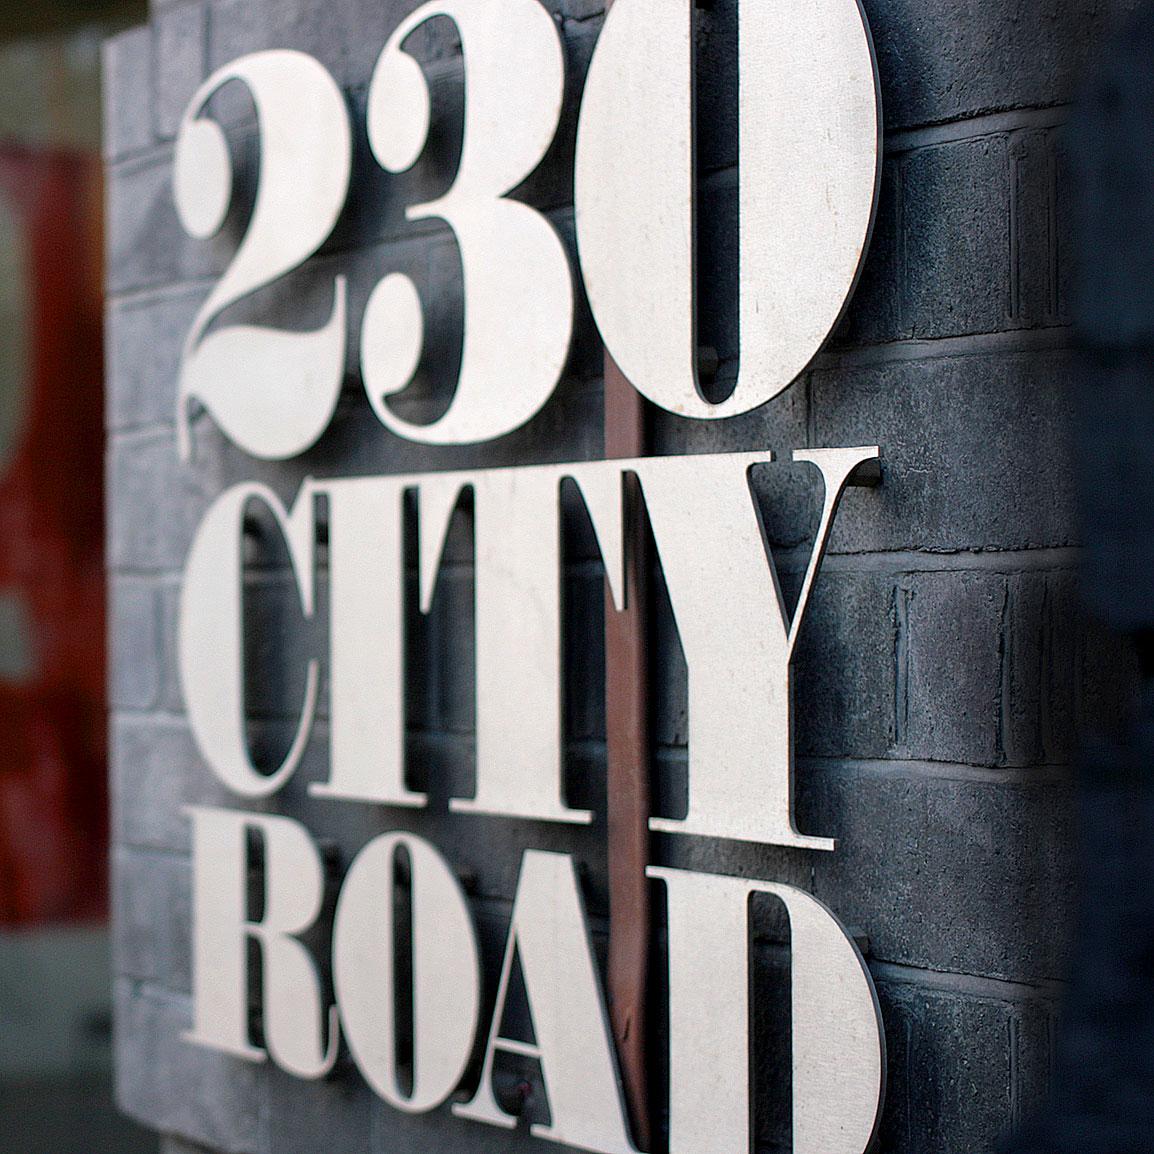 230_city_road